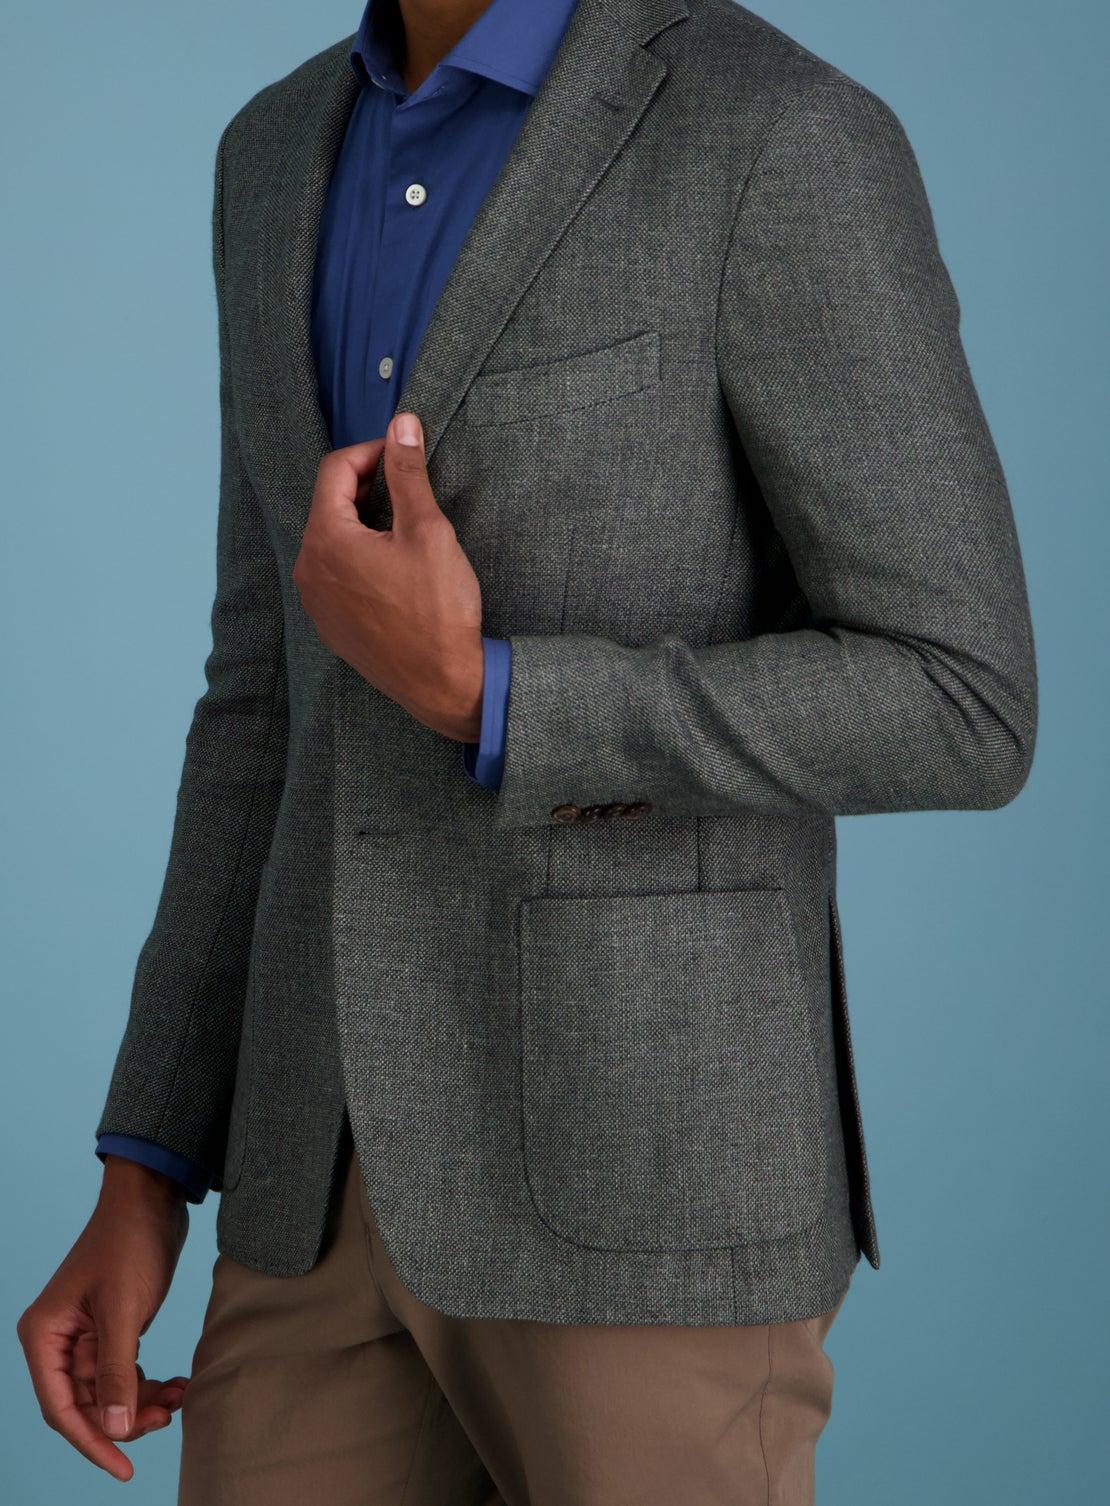 Evora Charcoal Textured Jacket